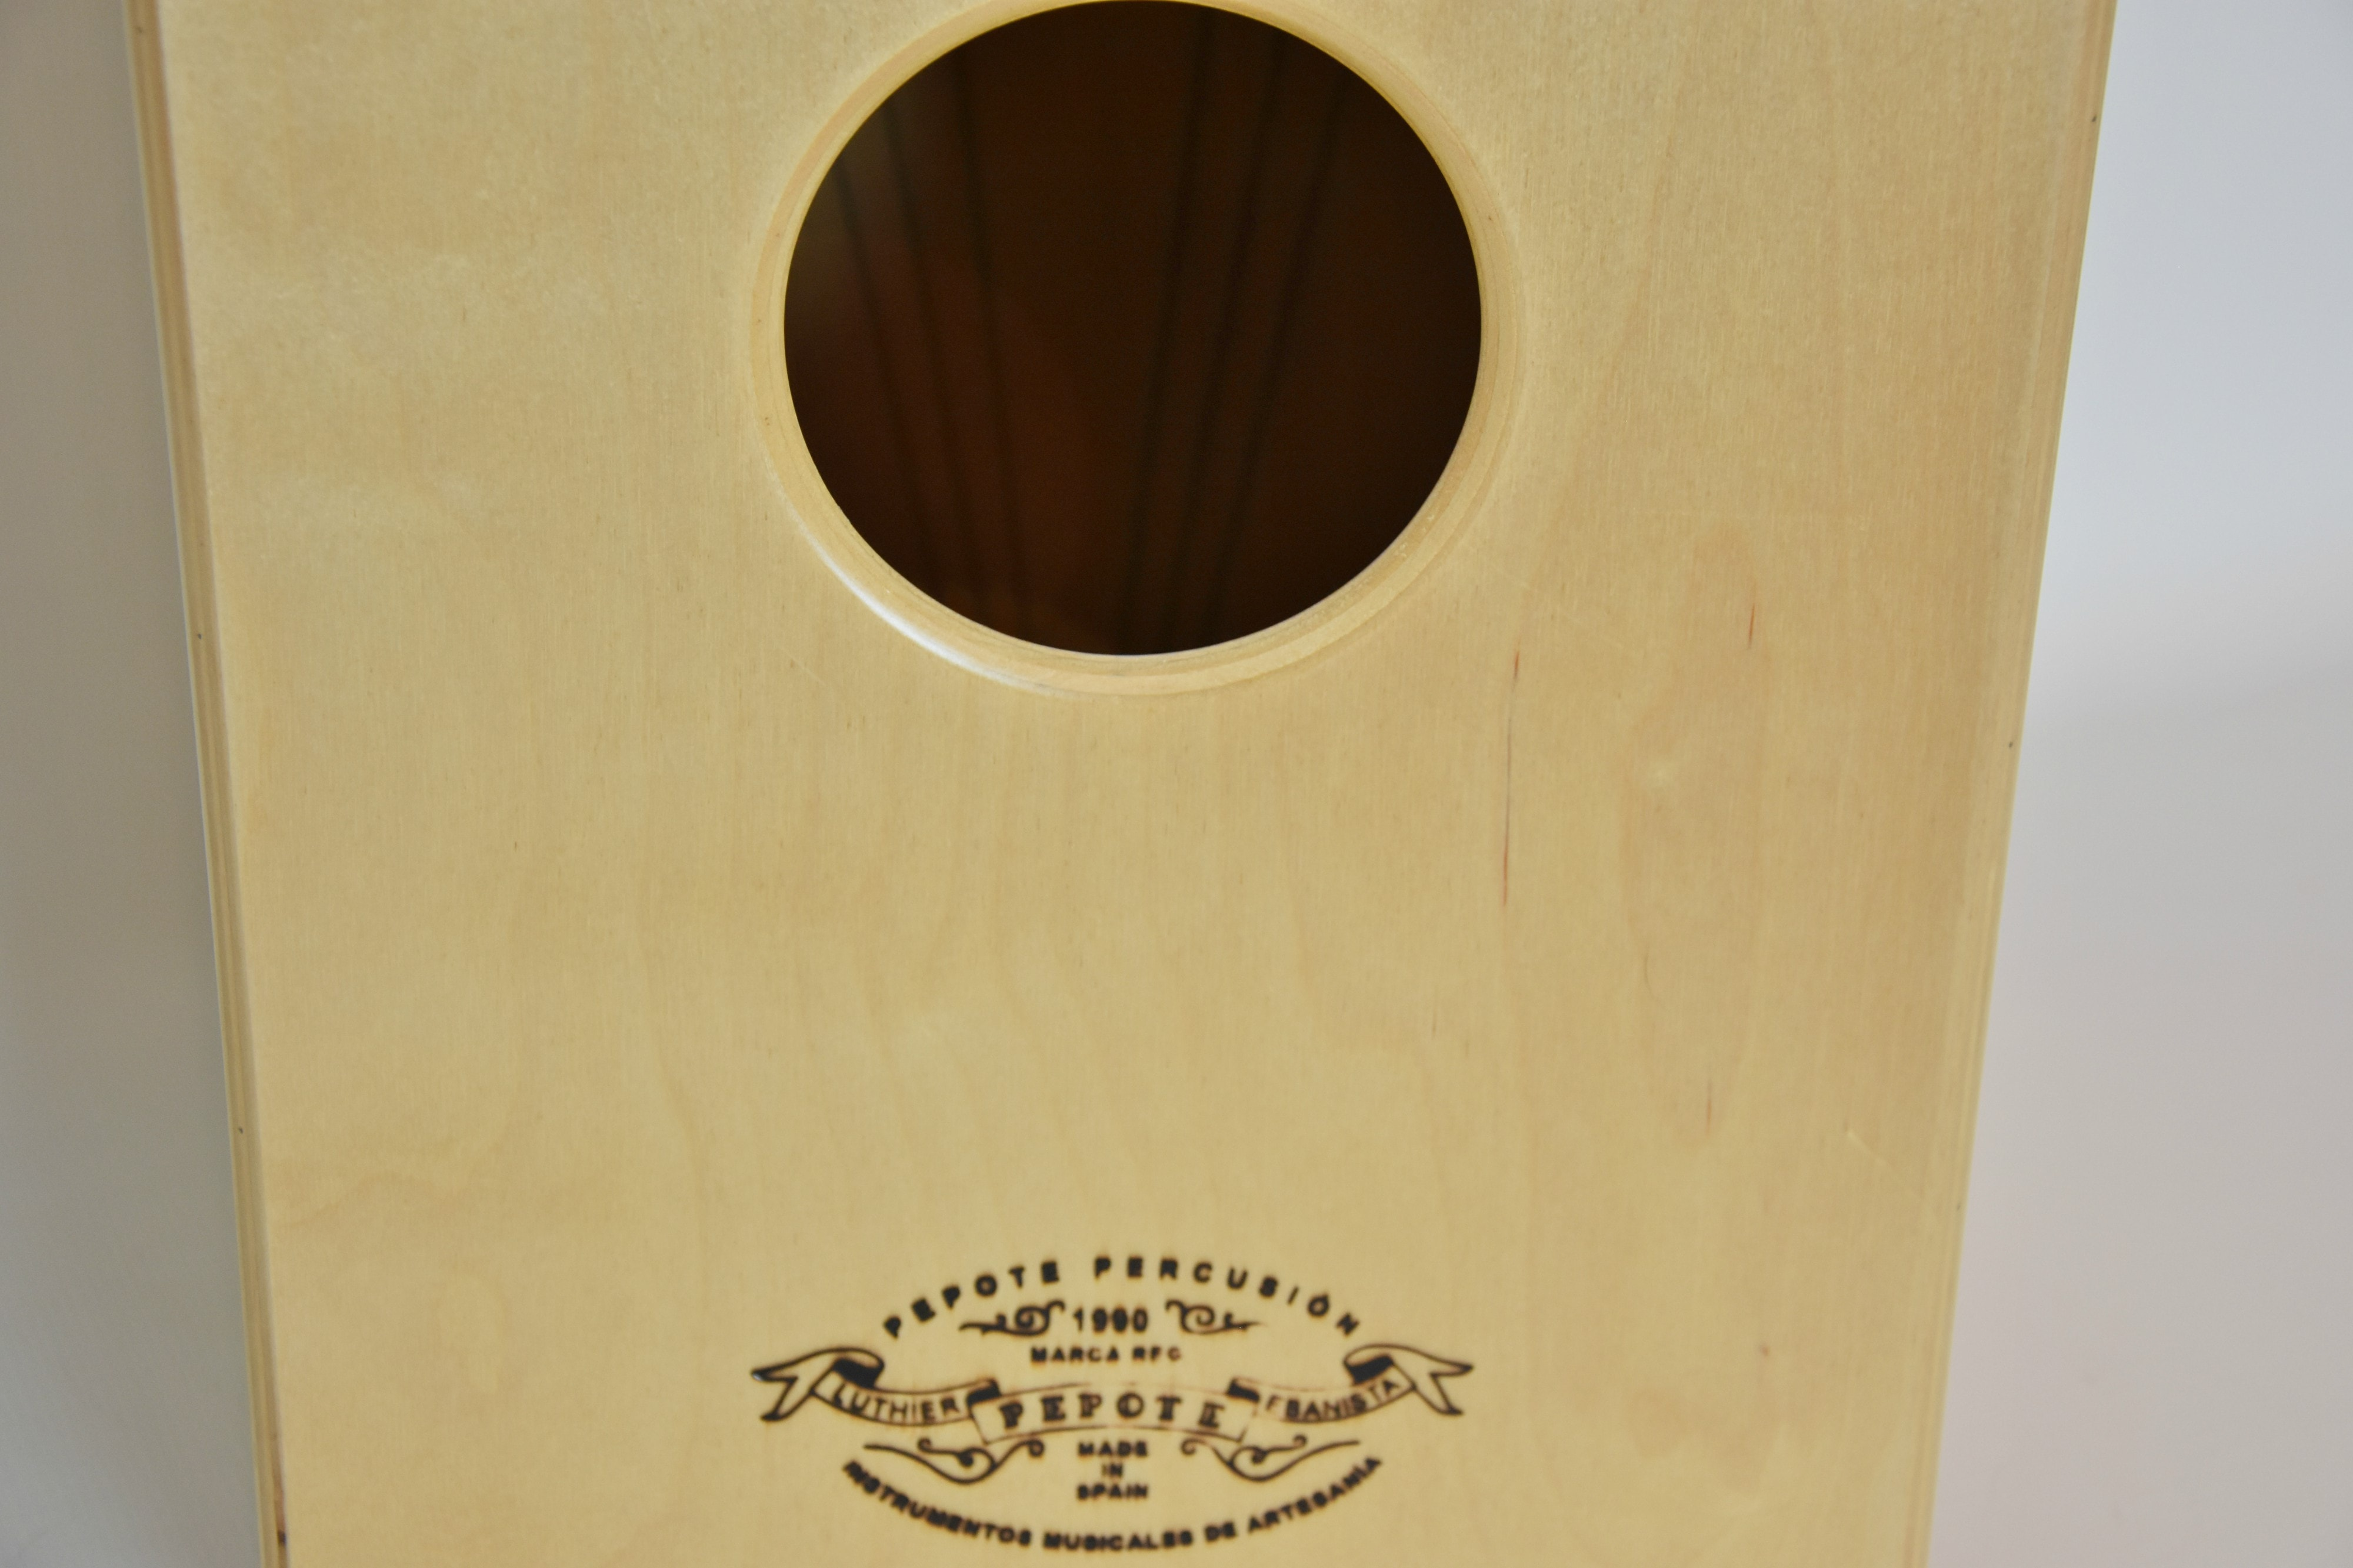 Meinl Artisan Edition Tango Line sound port